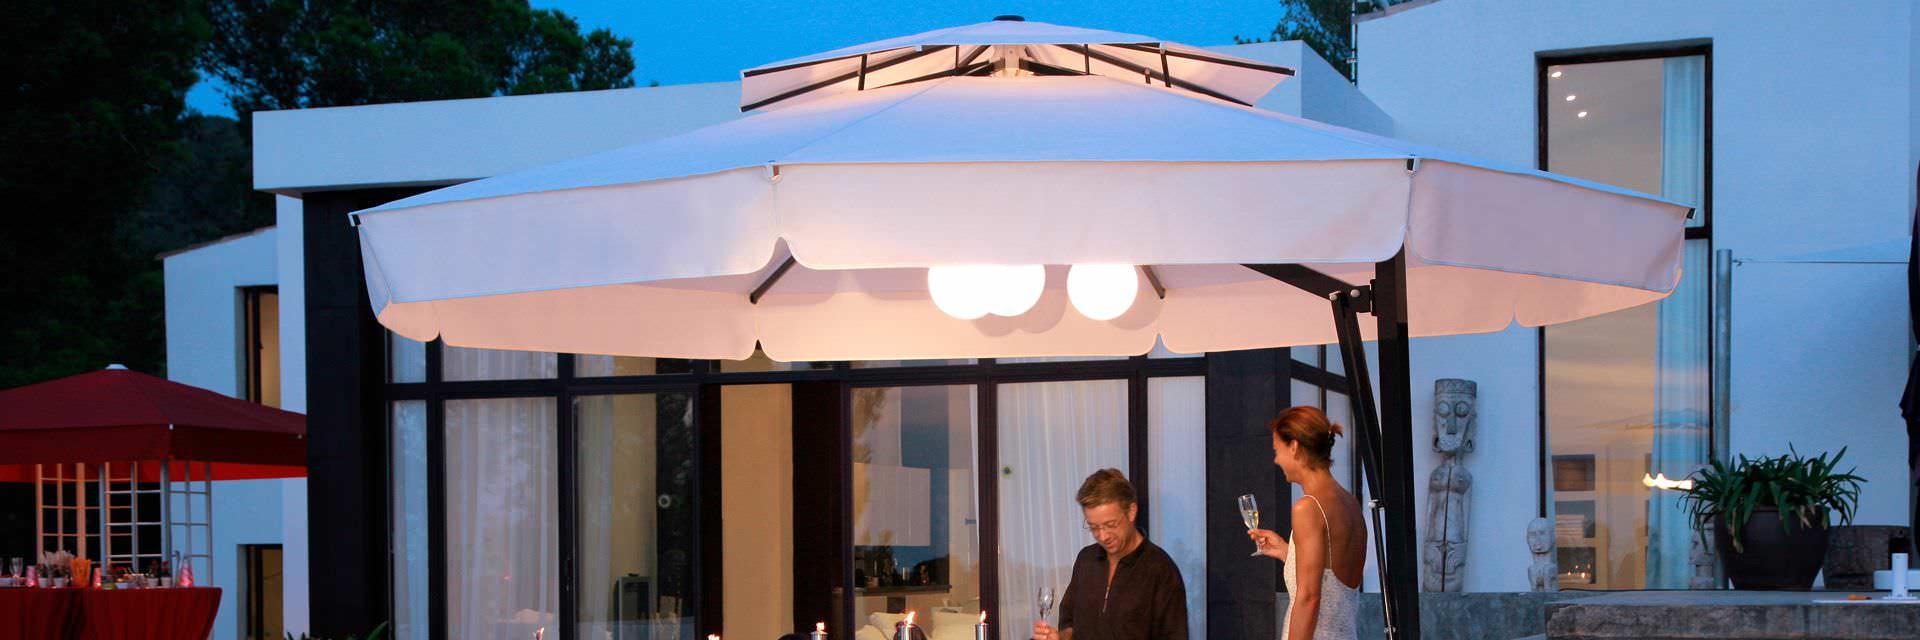 Sonnenschirm Belvedere